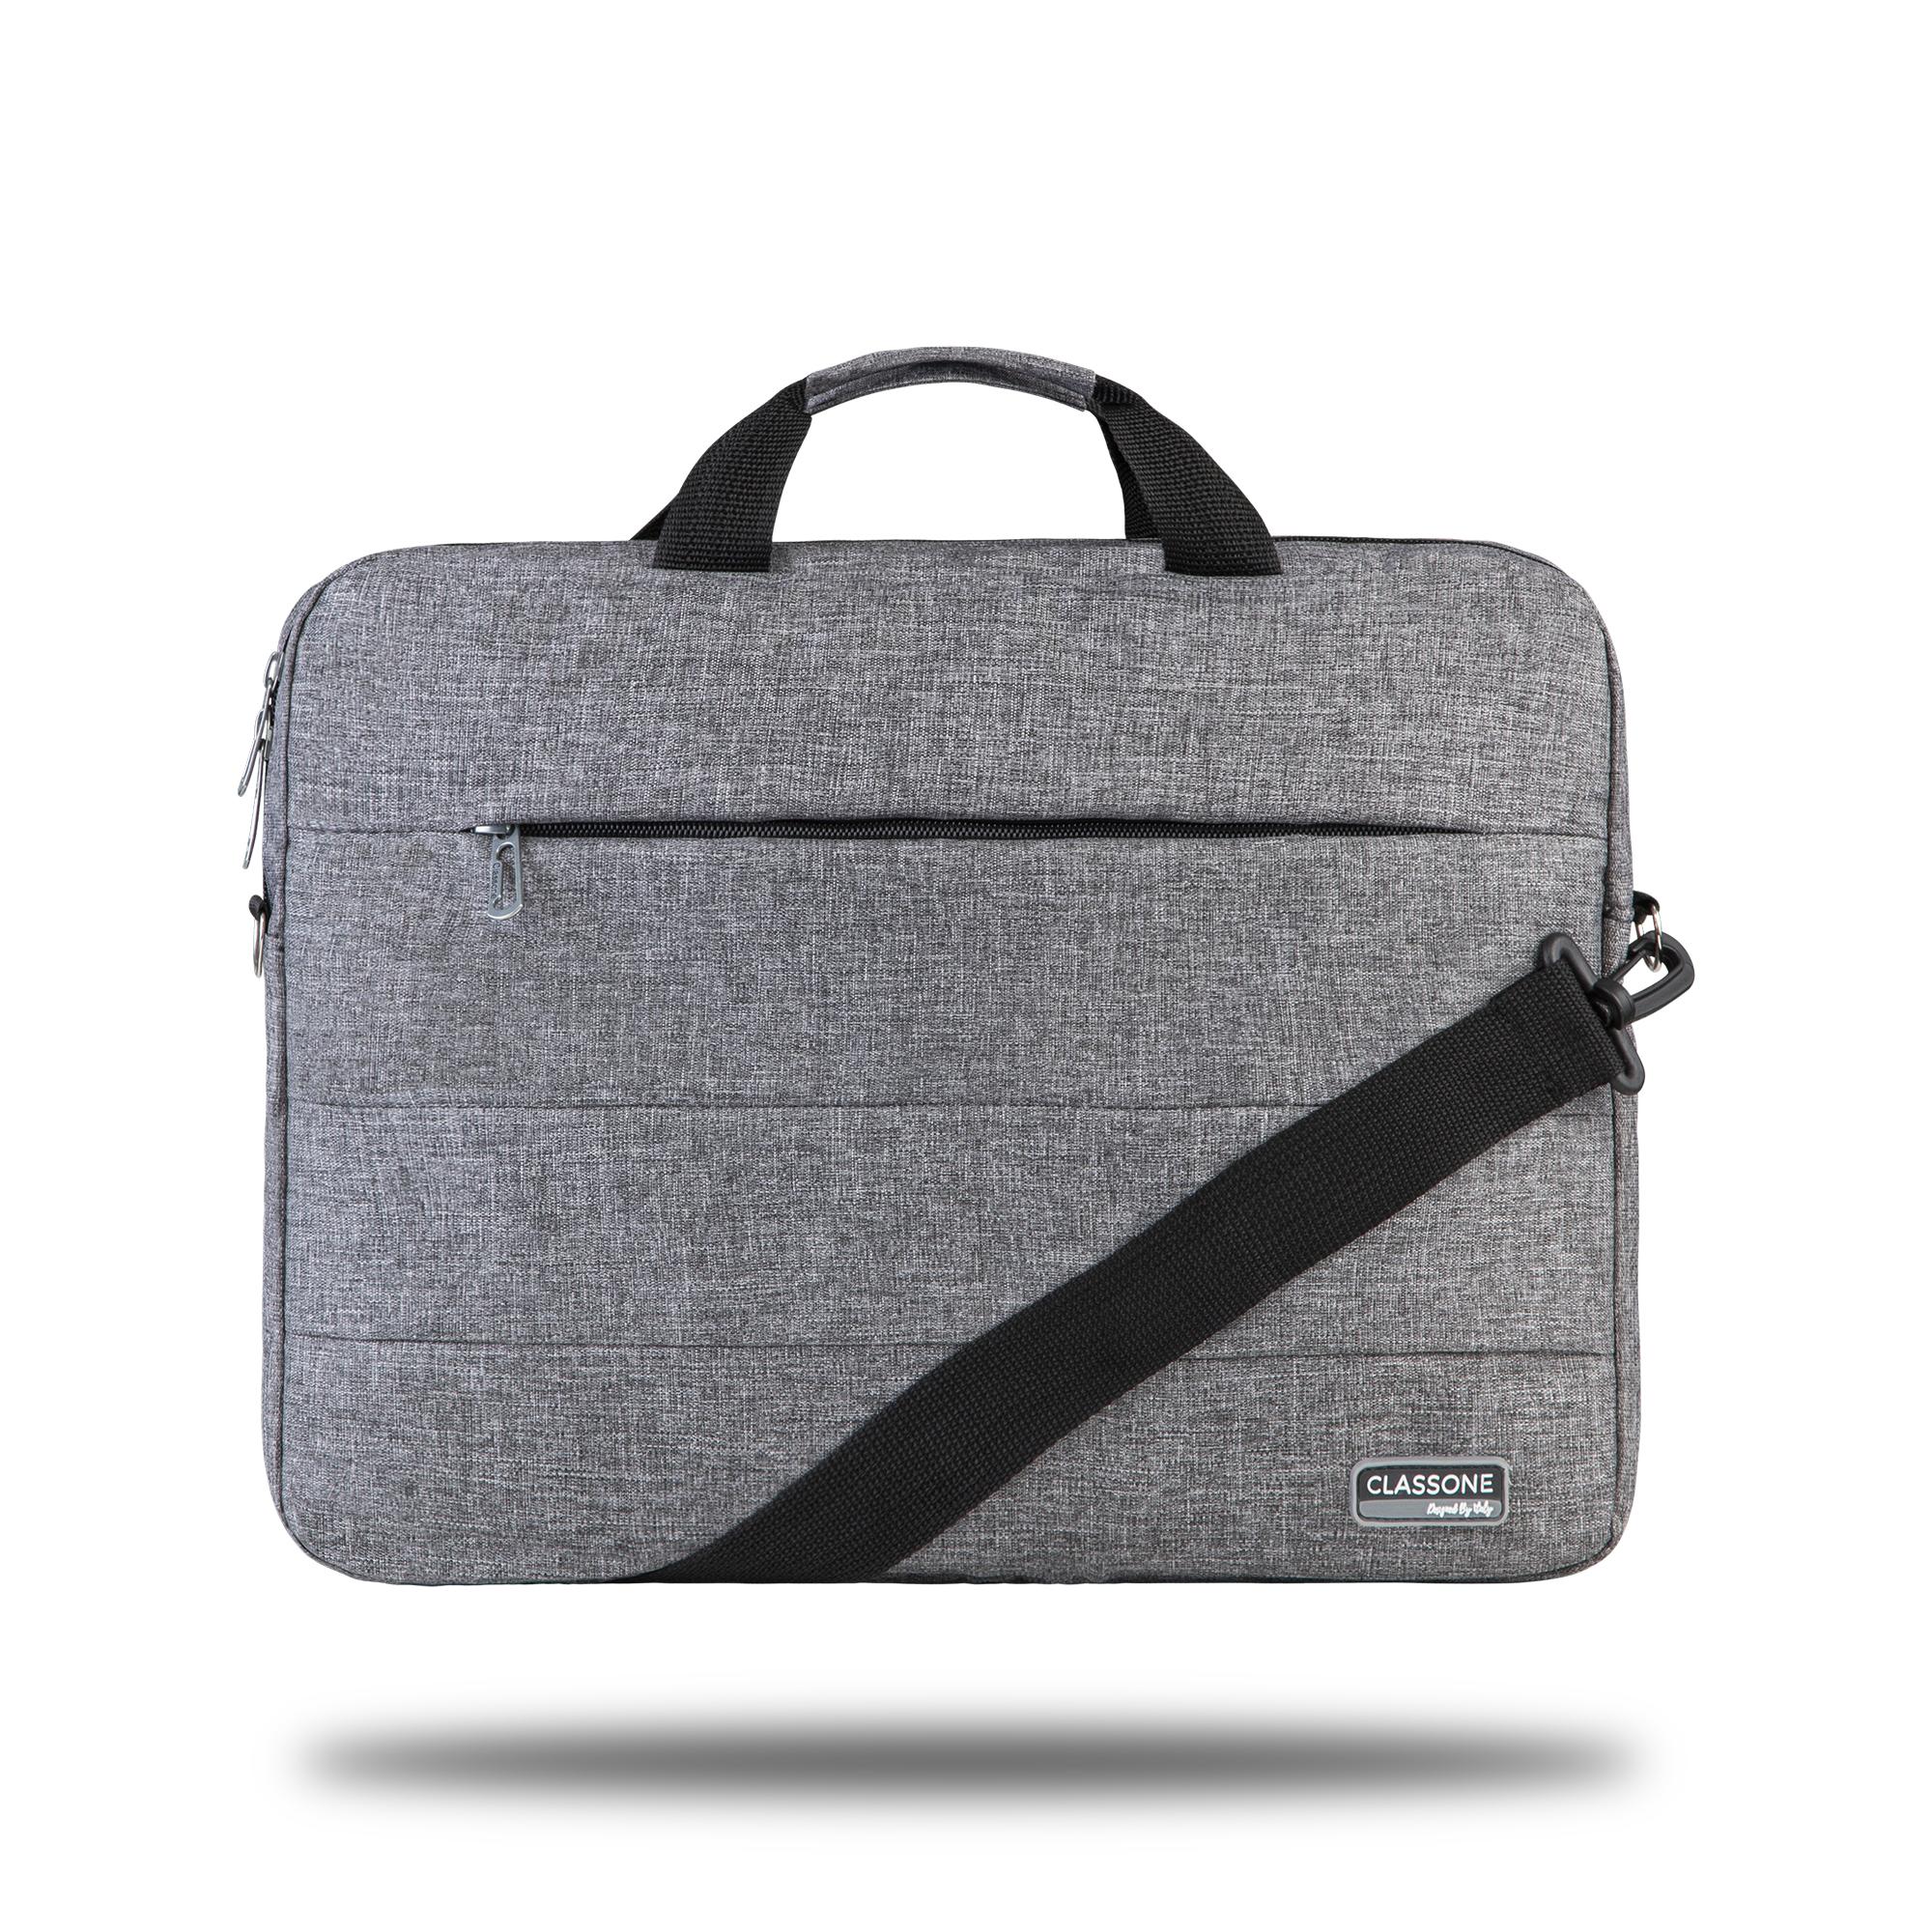 Classone Romeo Large Serisi TL2004 15.6 inch Uyumlu Notebook Çantası – Gri